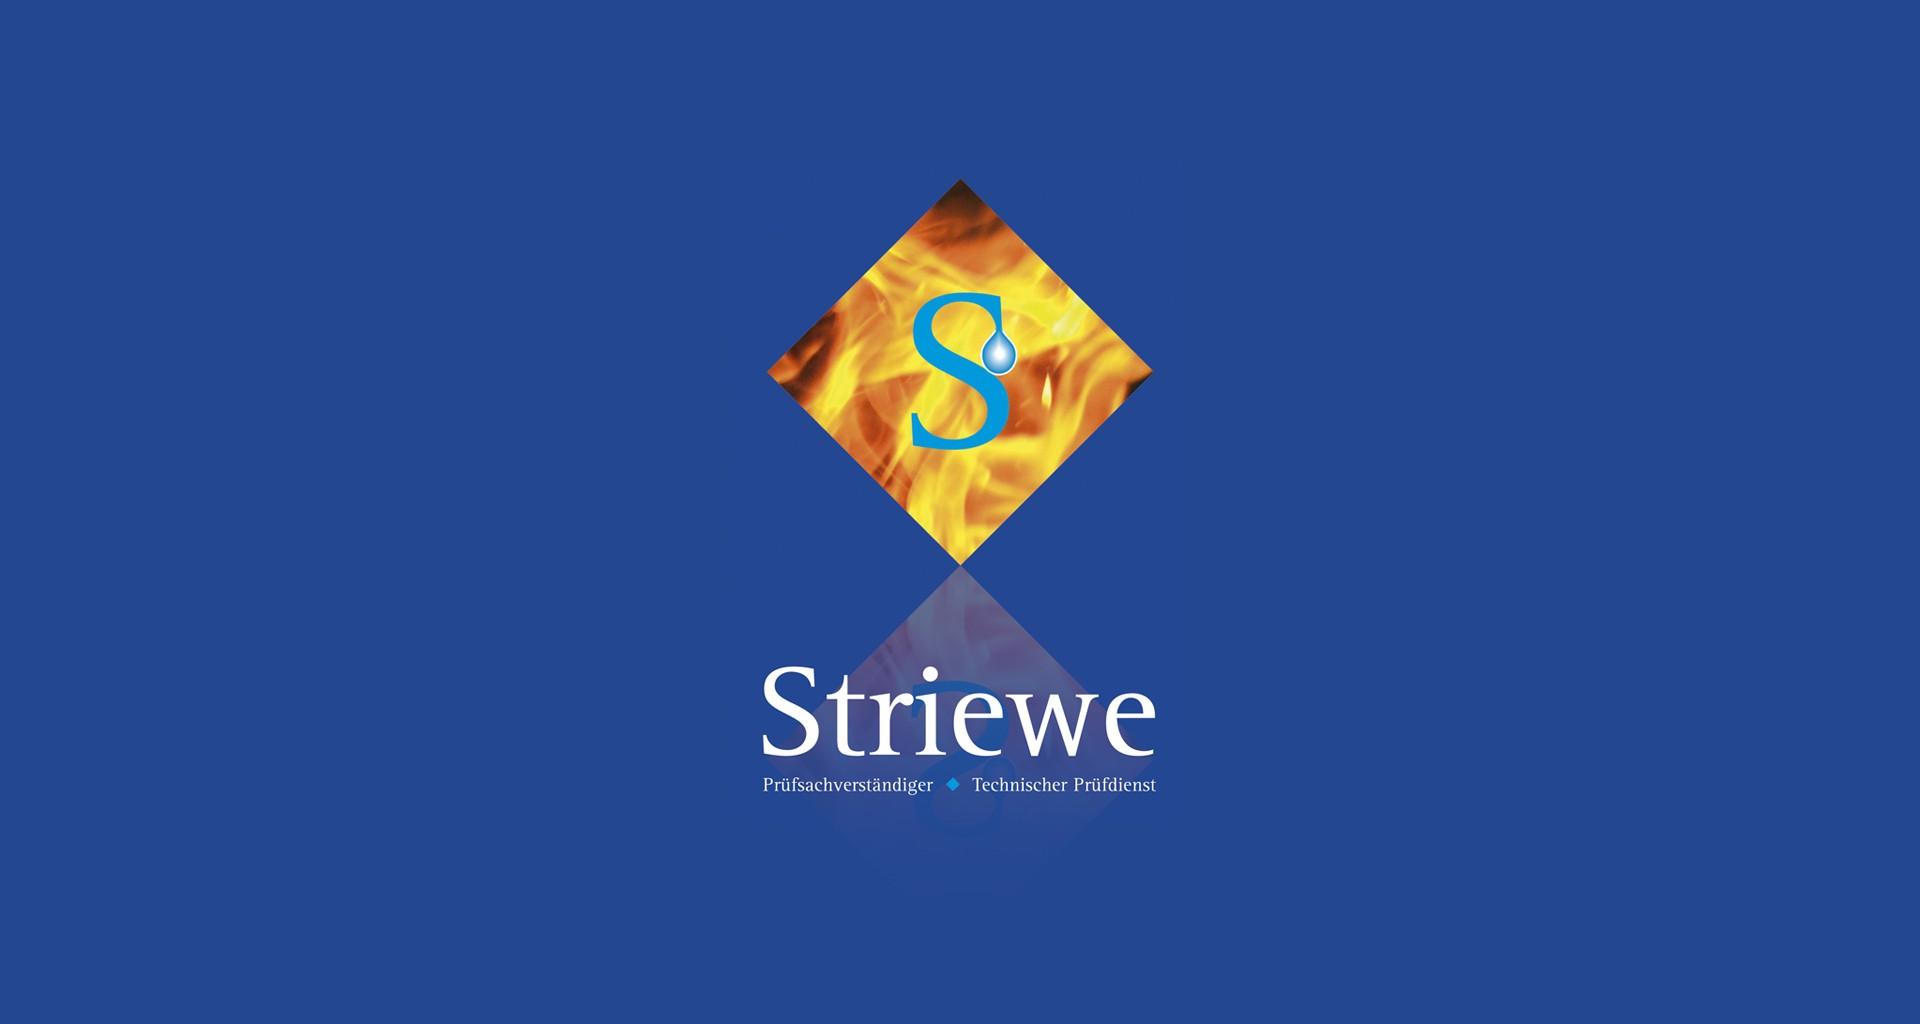 SLIDER_STRIEWE-LOGO